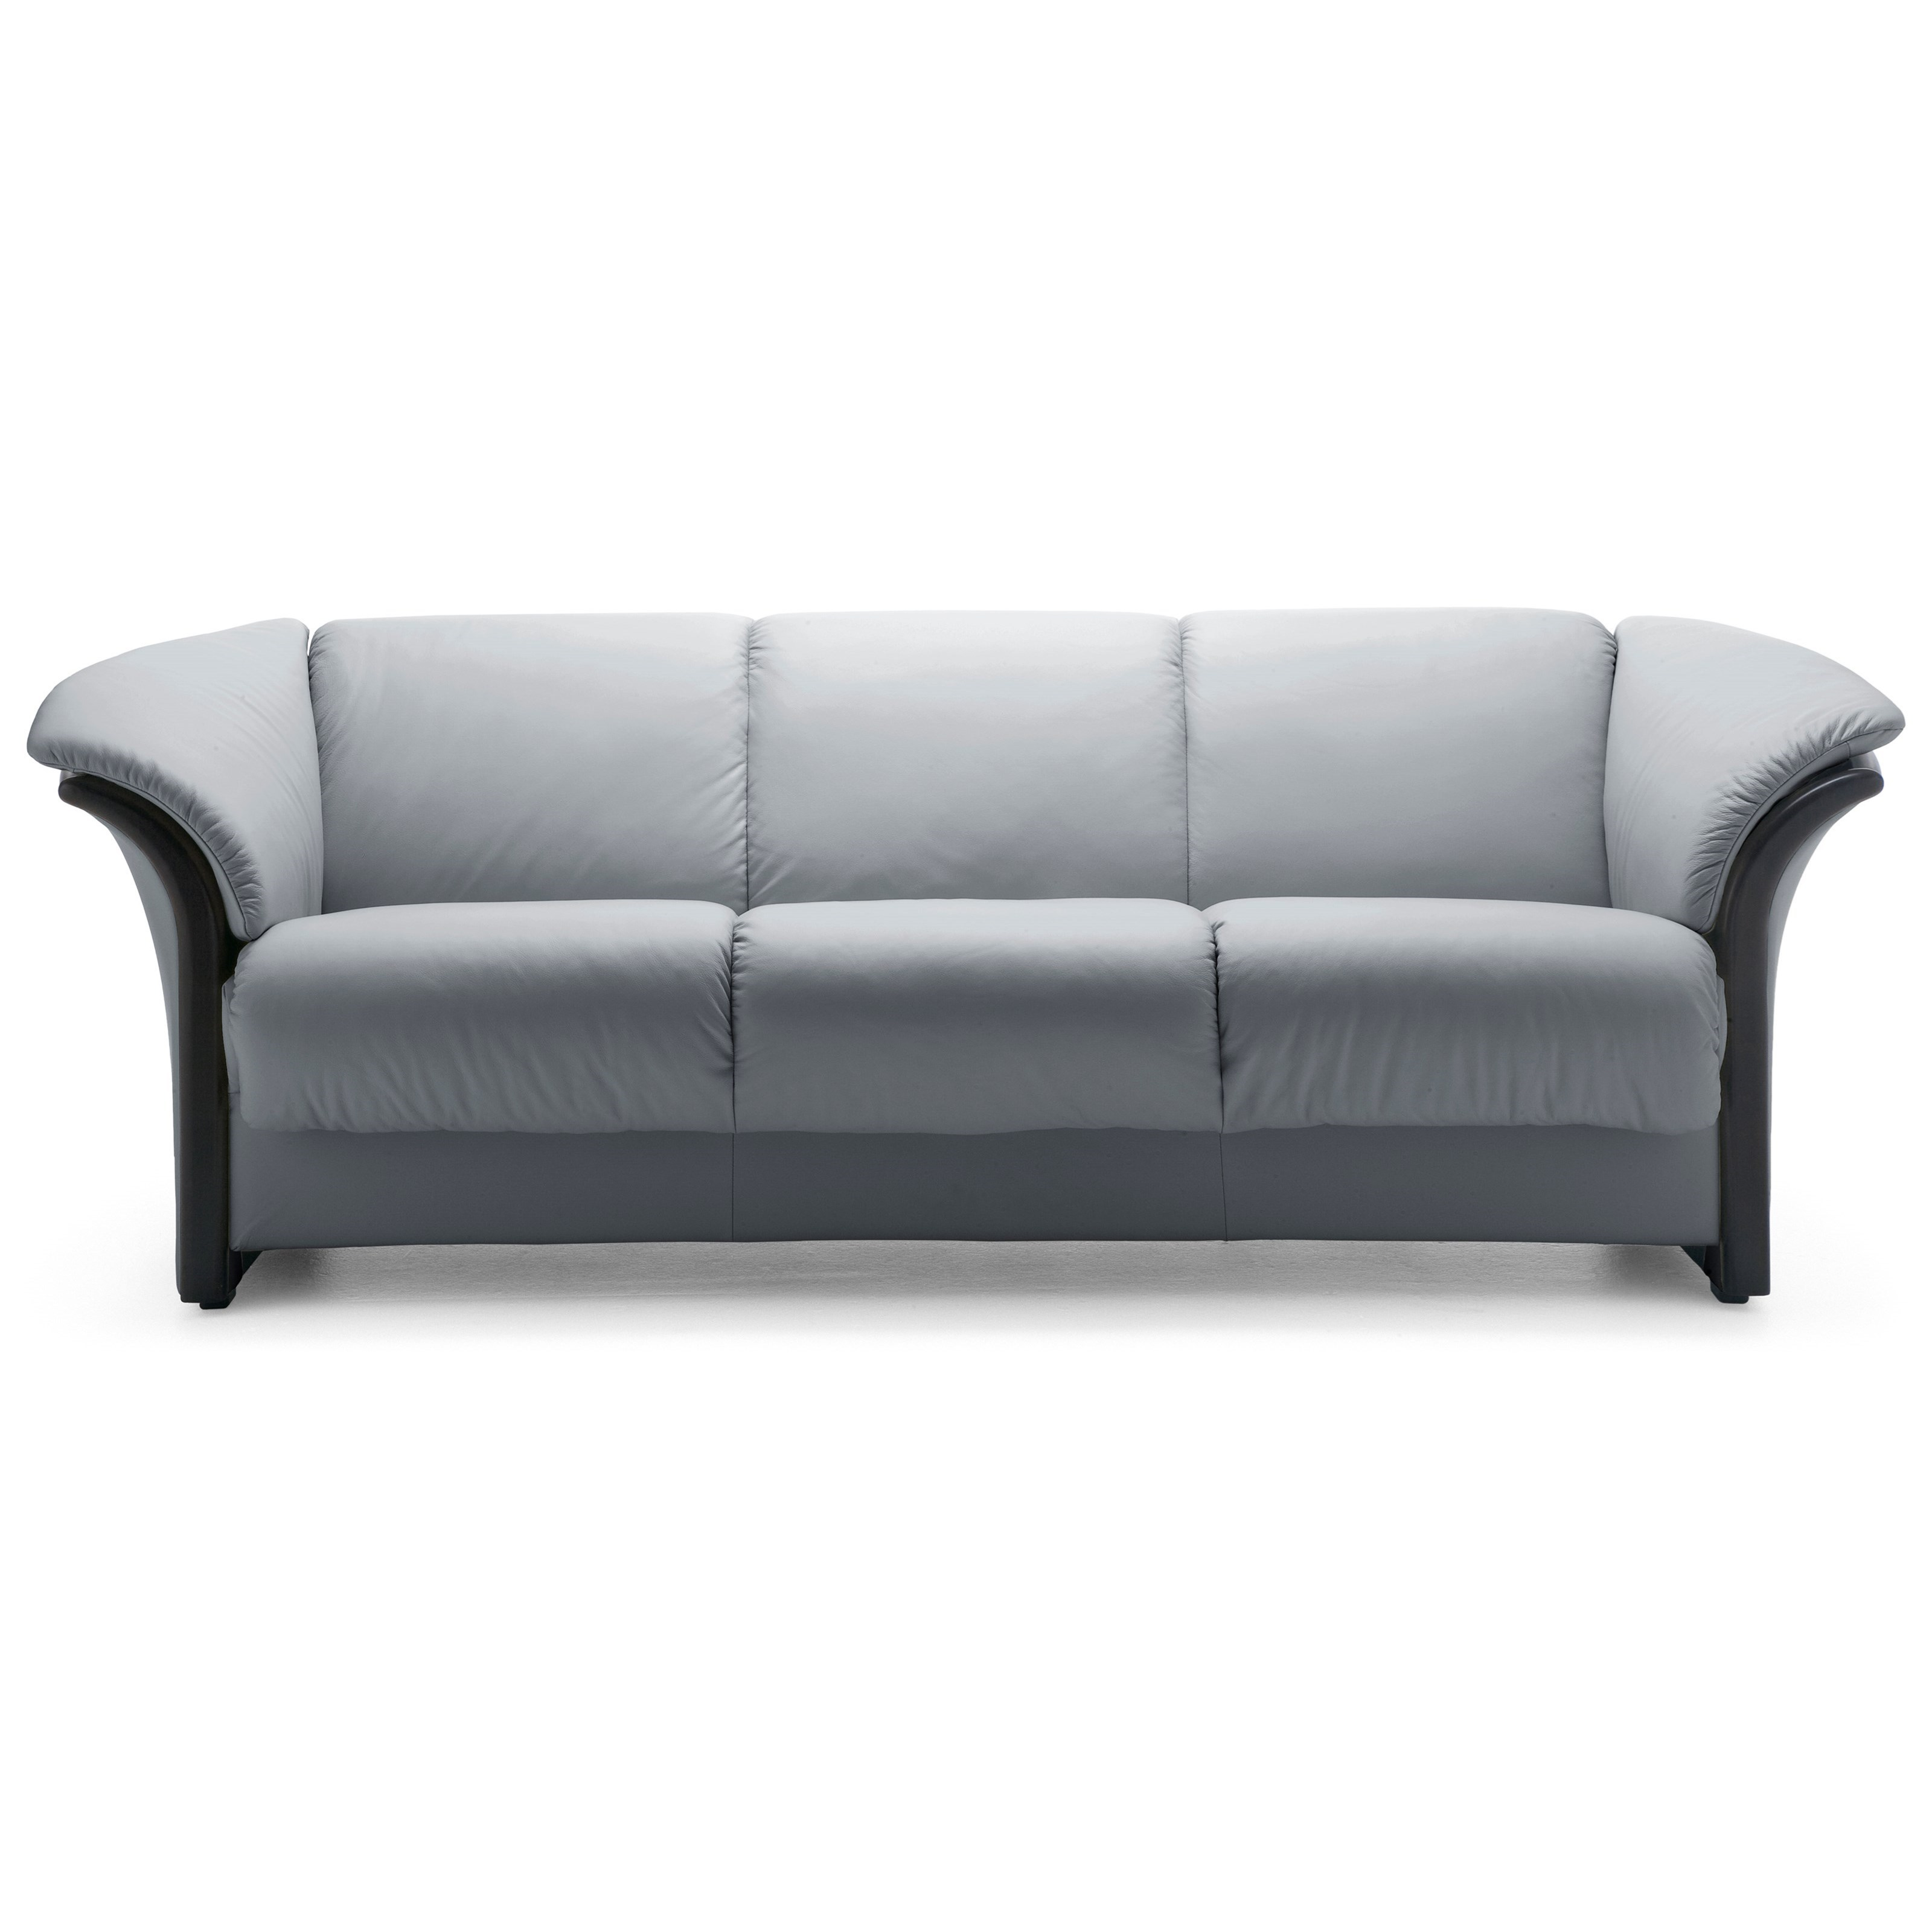 Manhattan Sofa by Stressless at Fashion Furniture